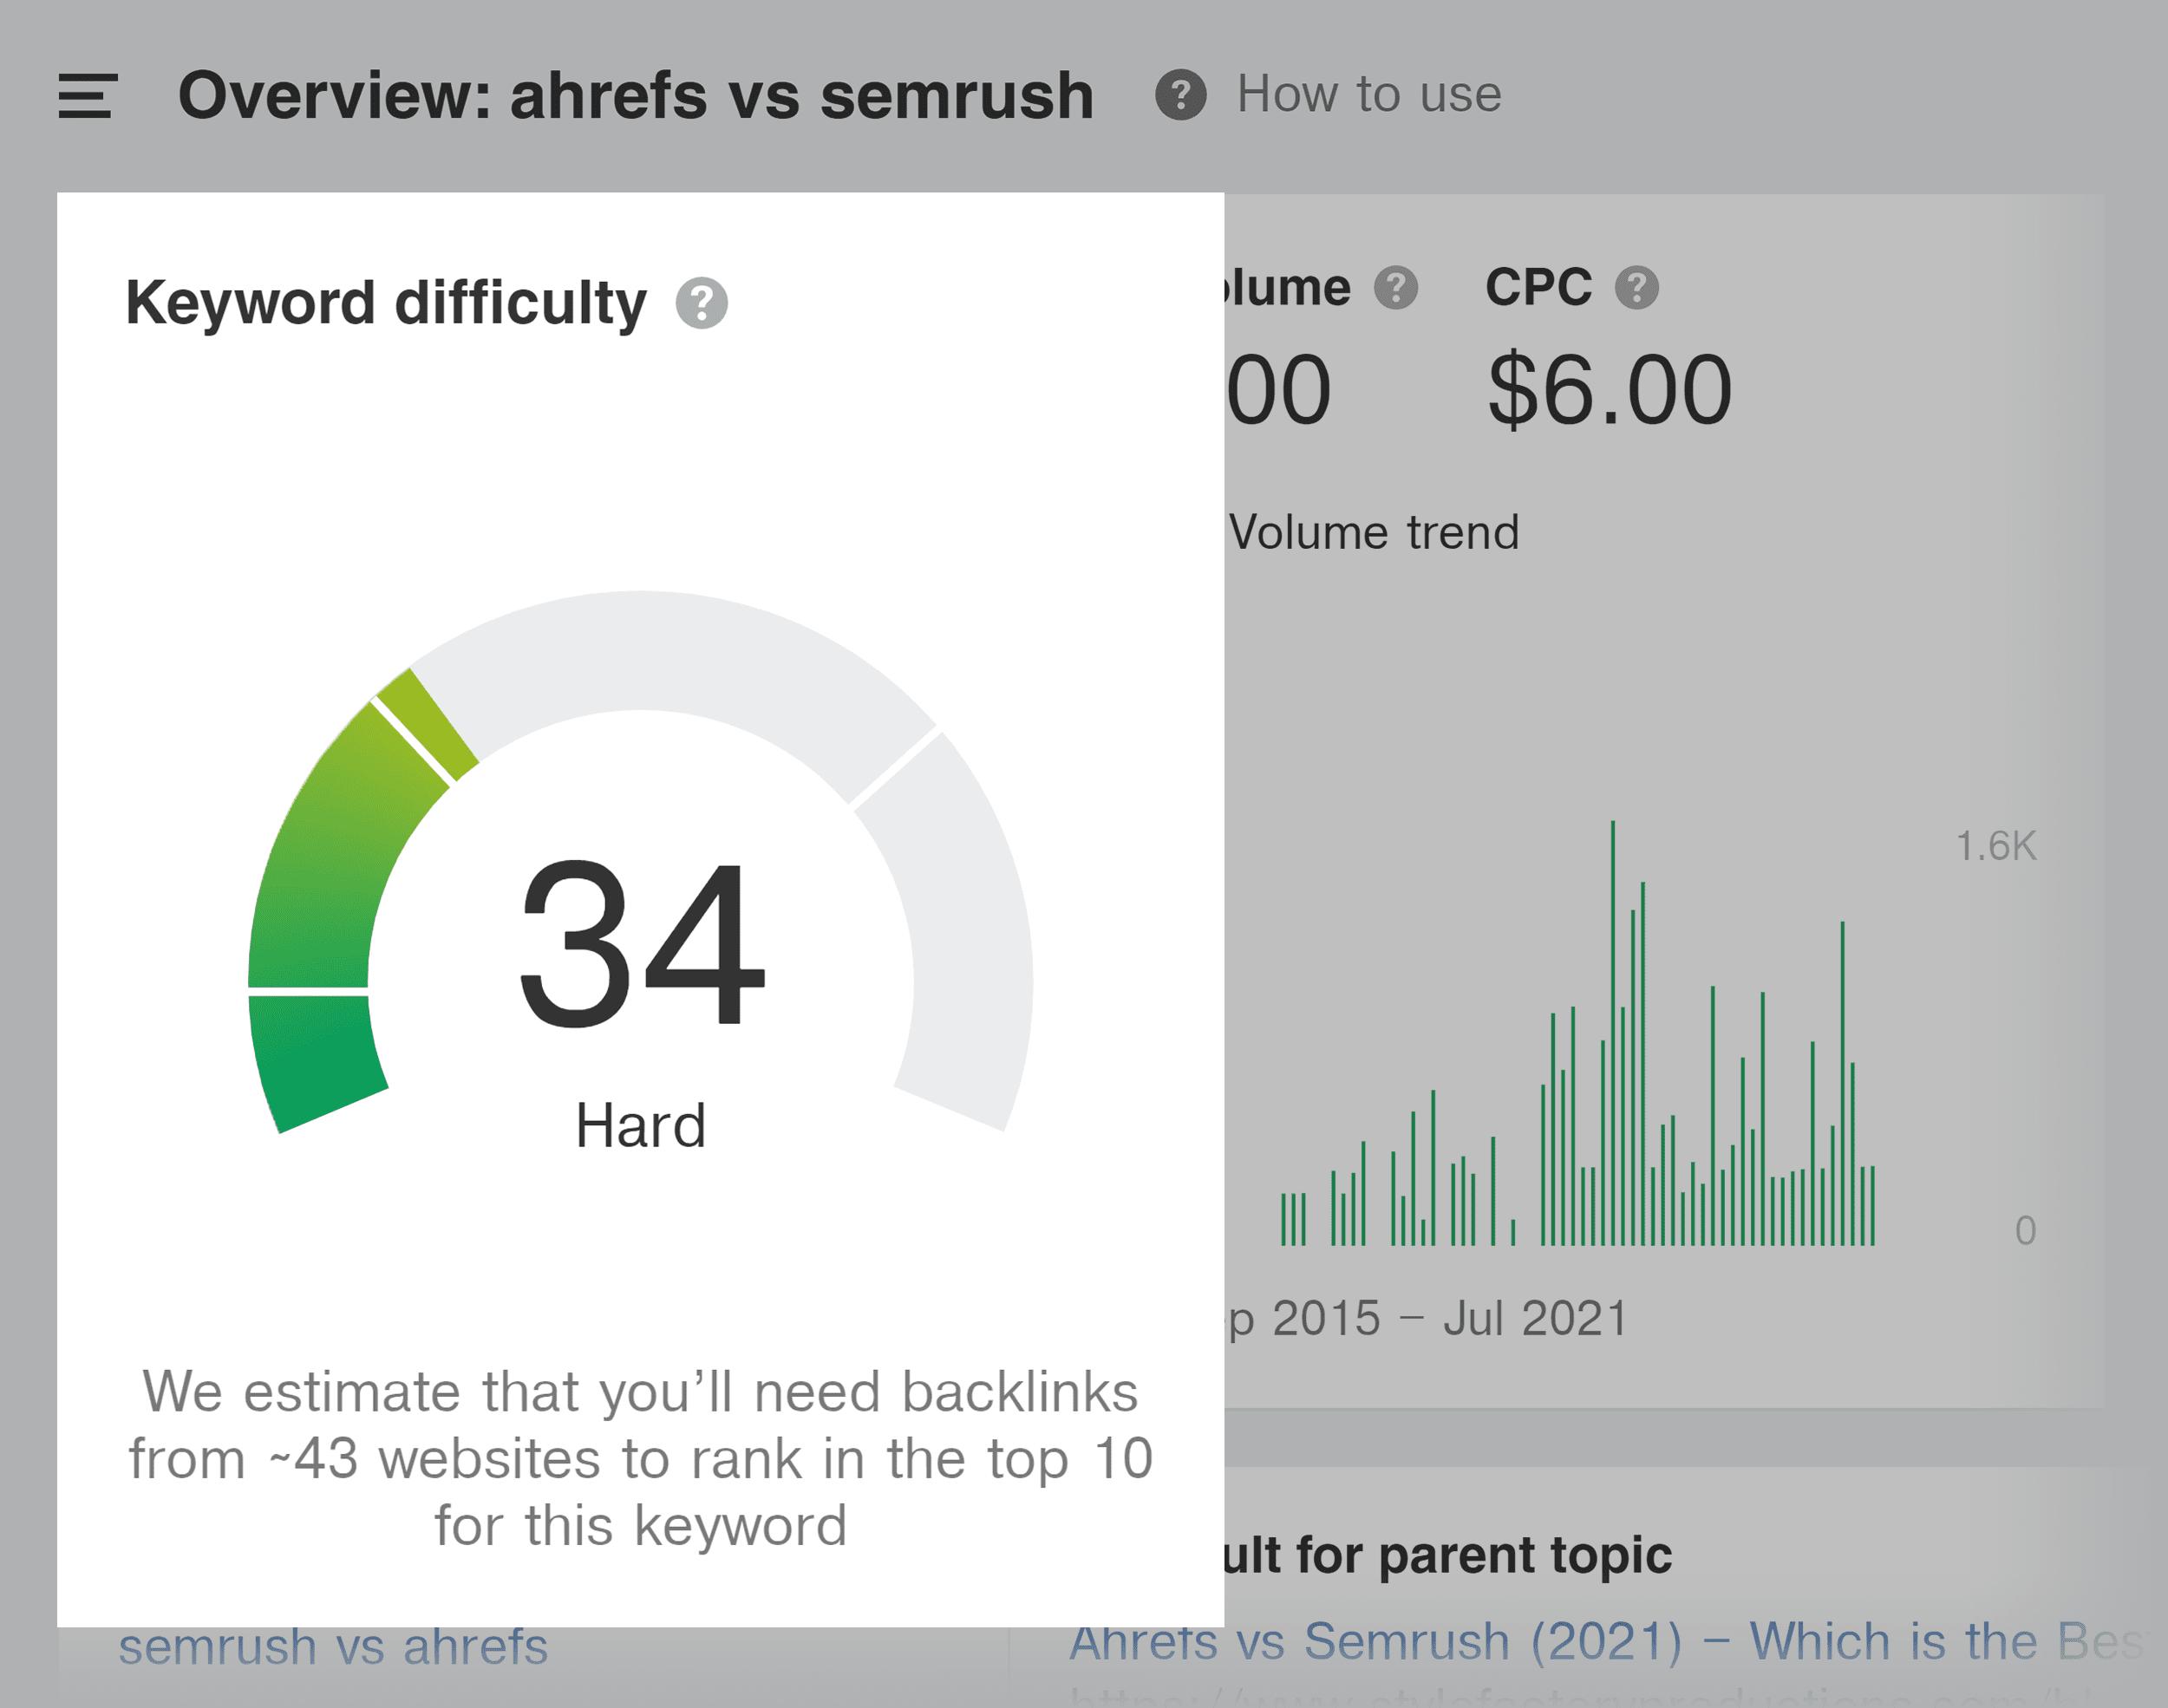 Ahrefs vs SEMrush – Keyword difficulty